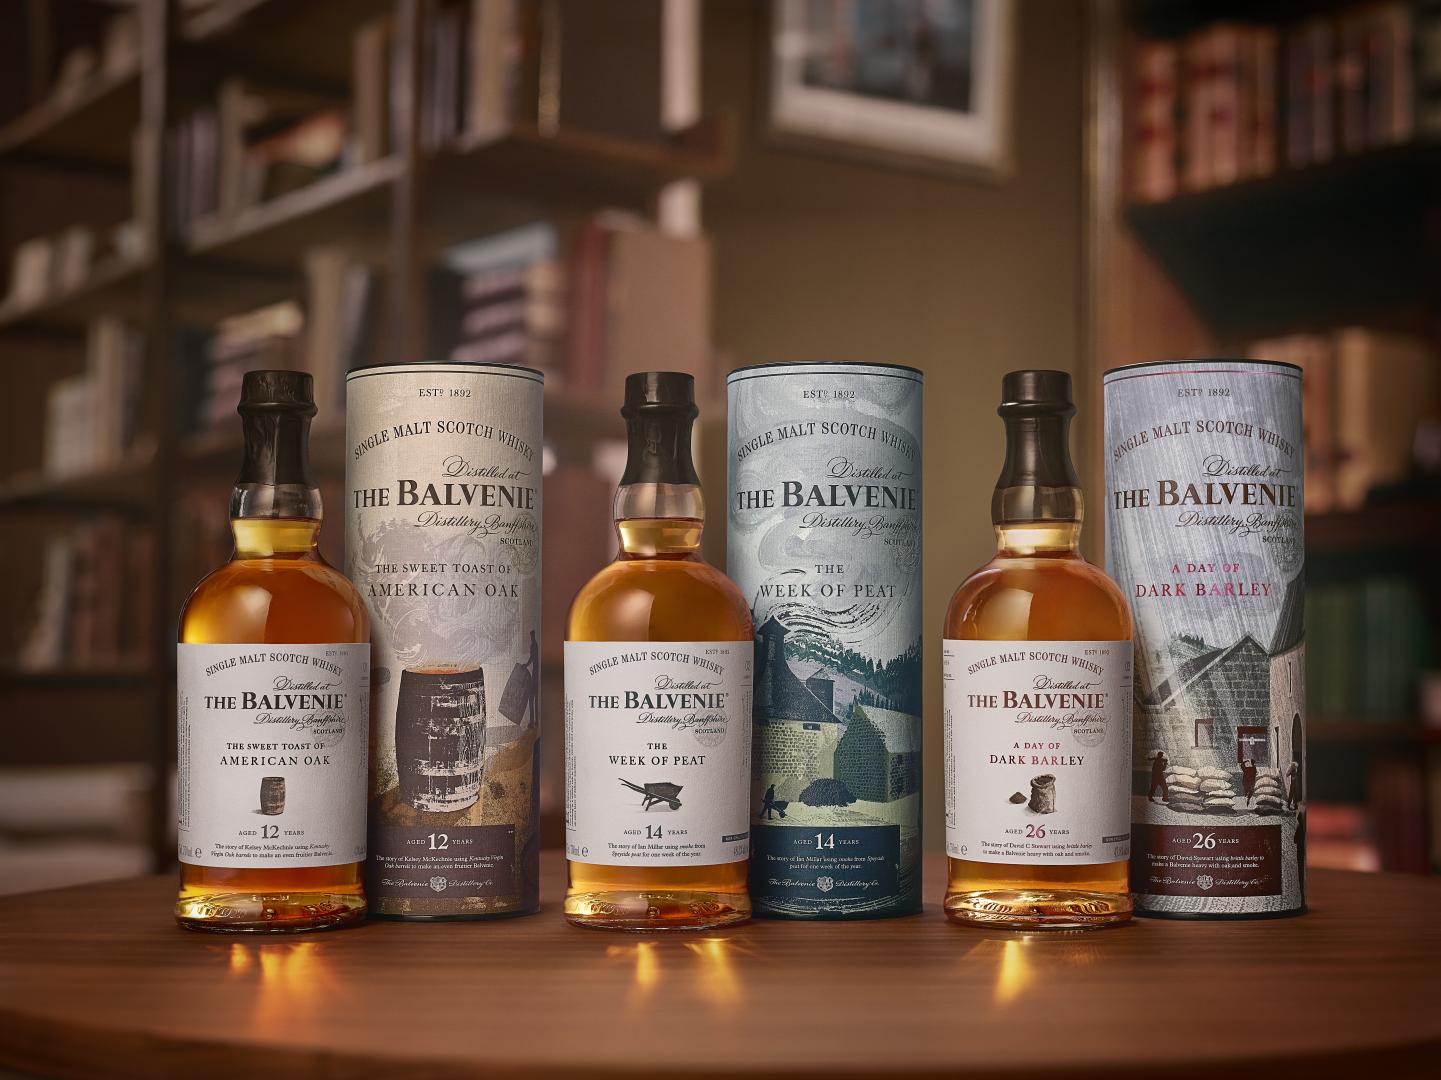 The Balvenie Stories - A Day of Dark Barley 26 Years Old